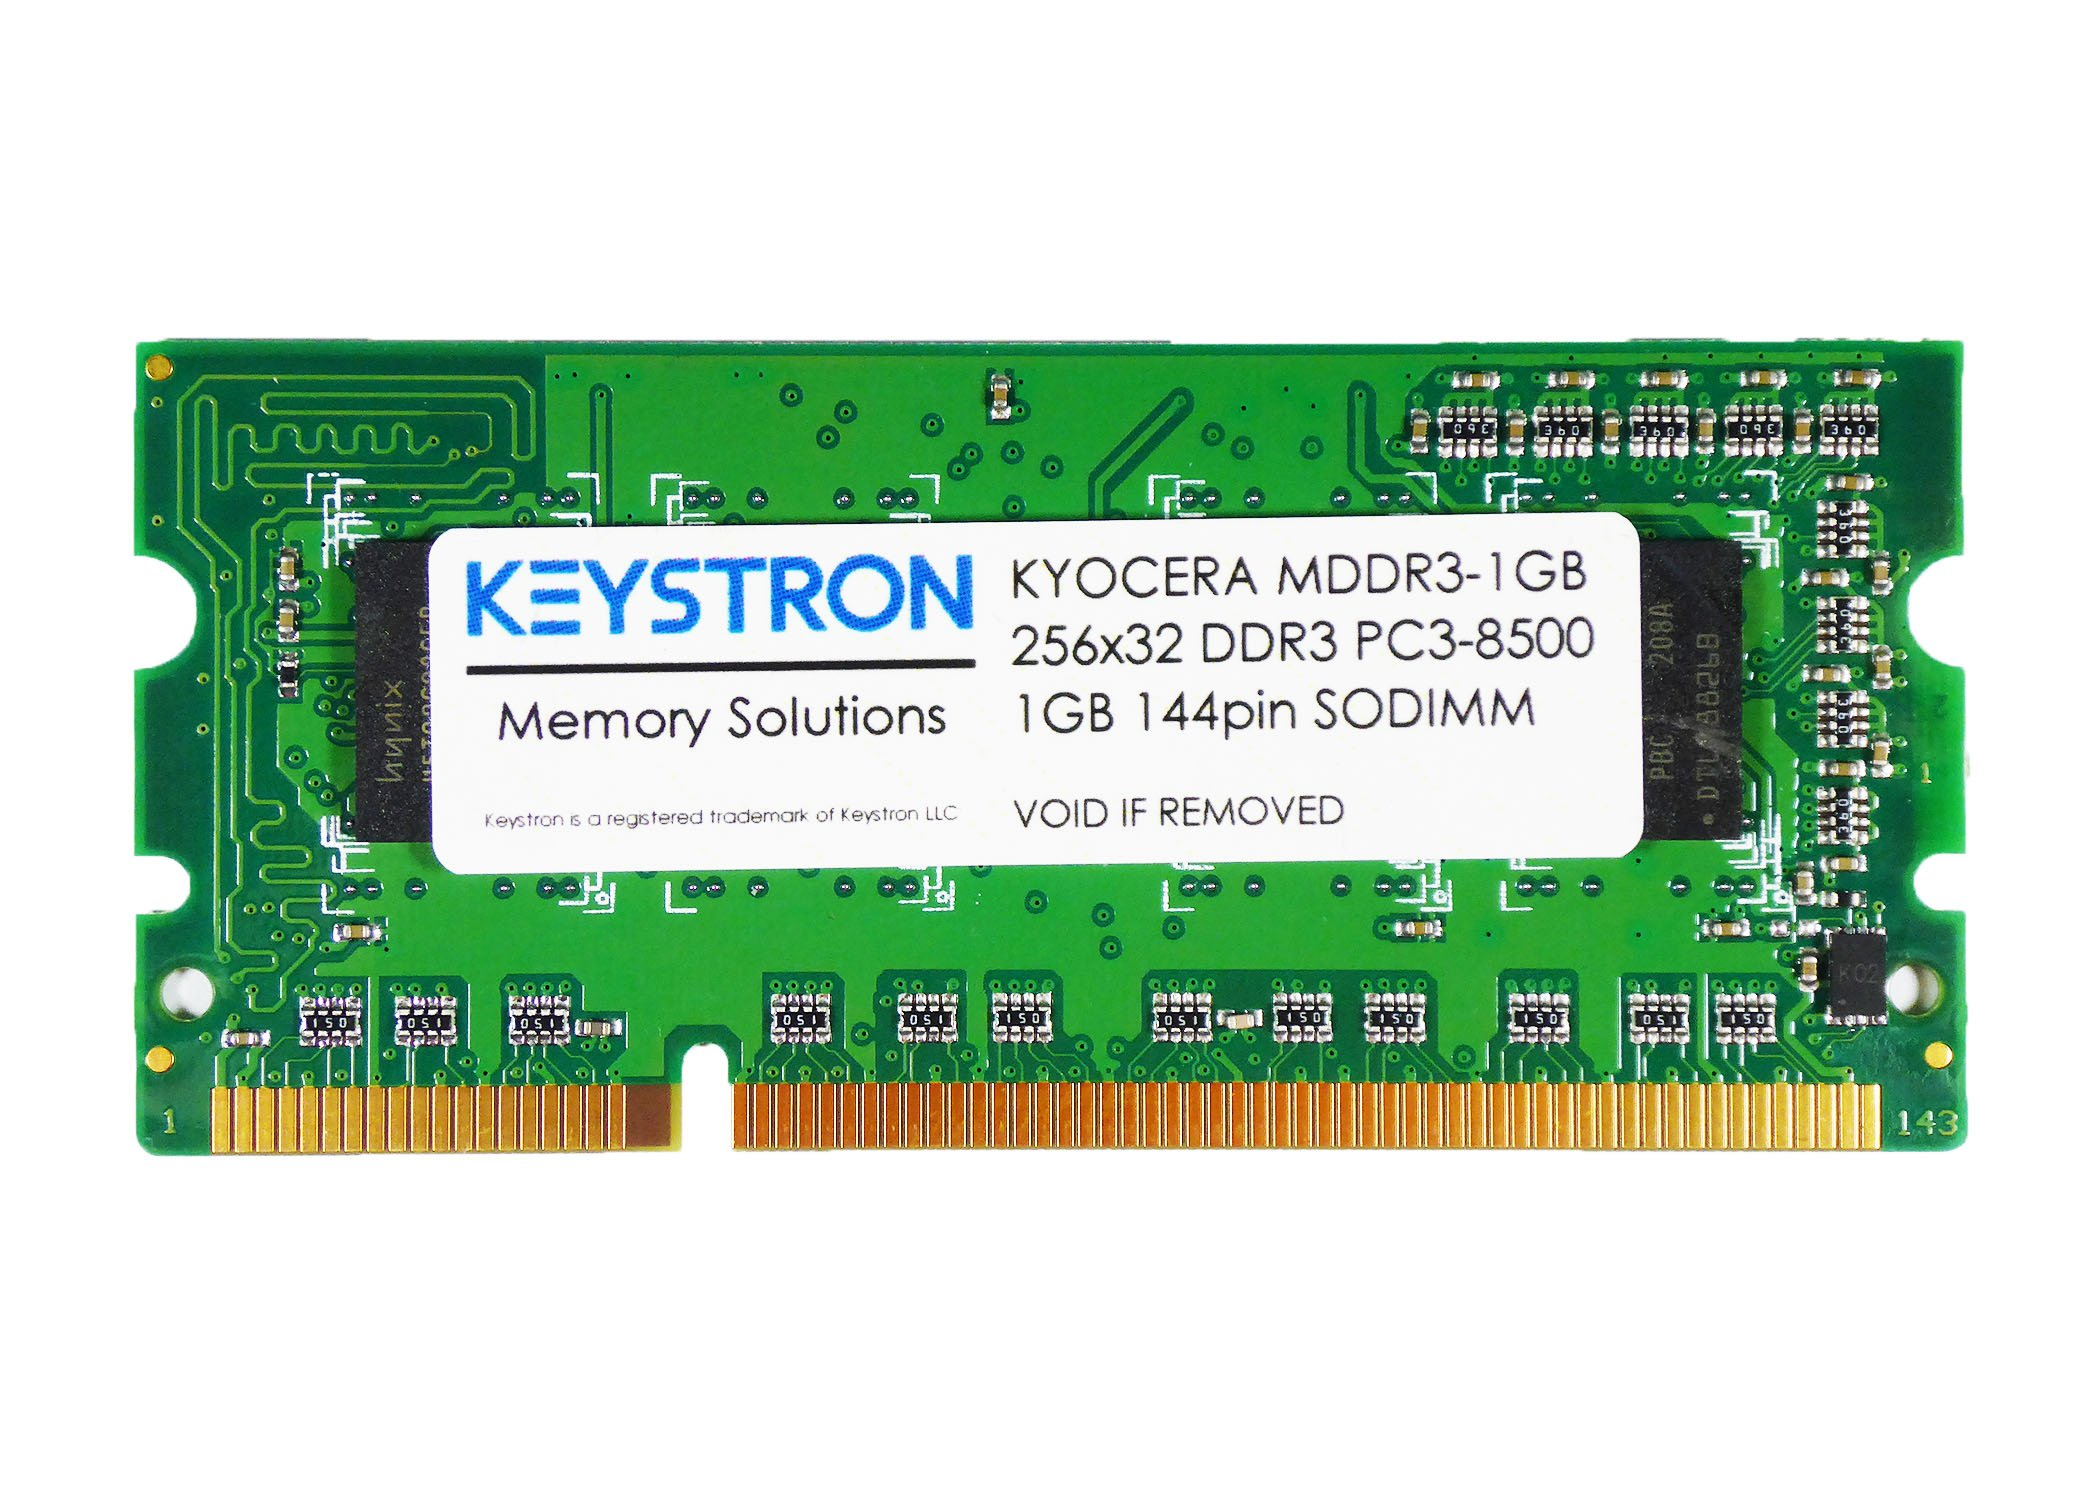 MDDR3-1GB 1GB Memory Upgrade for Kyocera ECOSYS M6026cdn/cidn, M6526cdn/cidn, P6021cdn, P6026cdn, P6030cdn, P7035cdn, P7060cdn Printer by Keystron